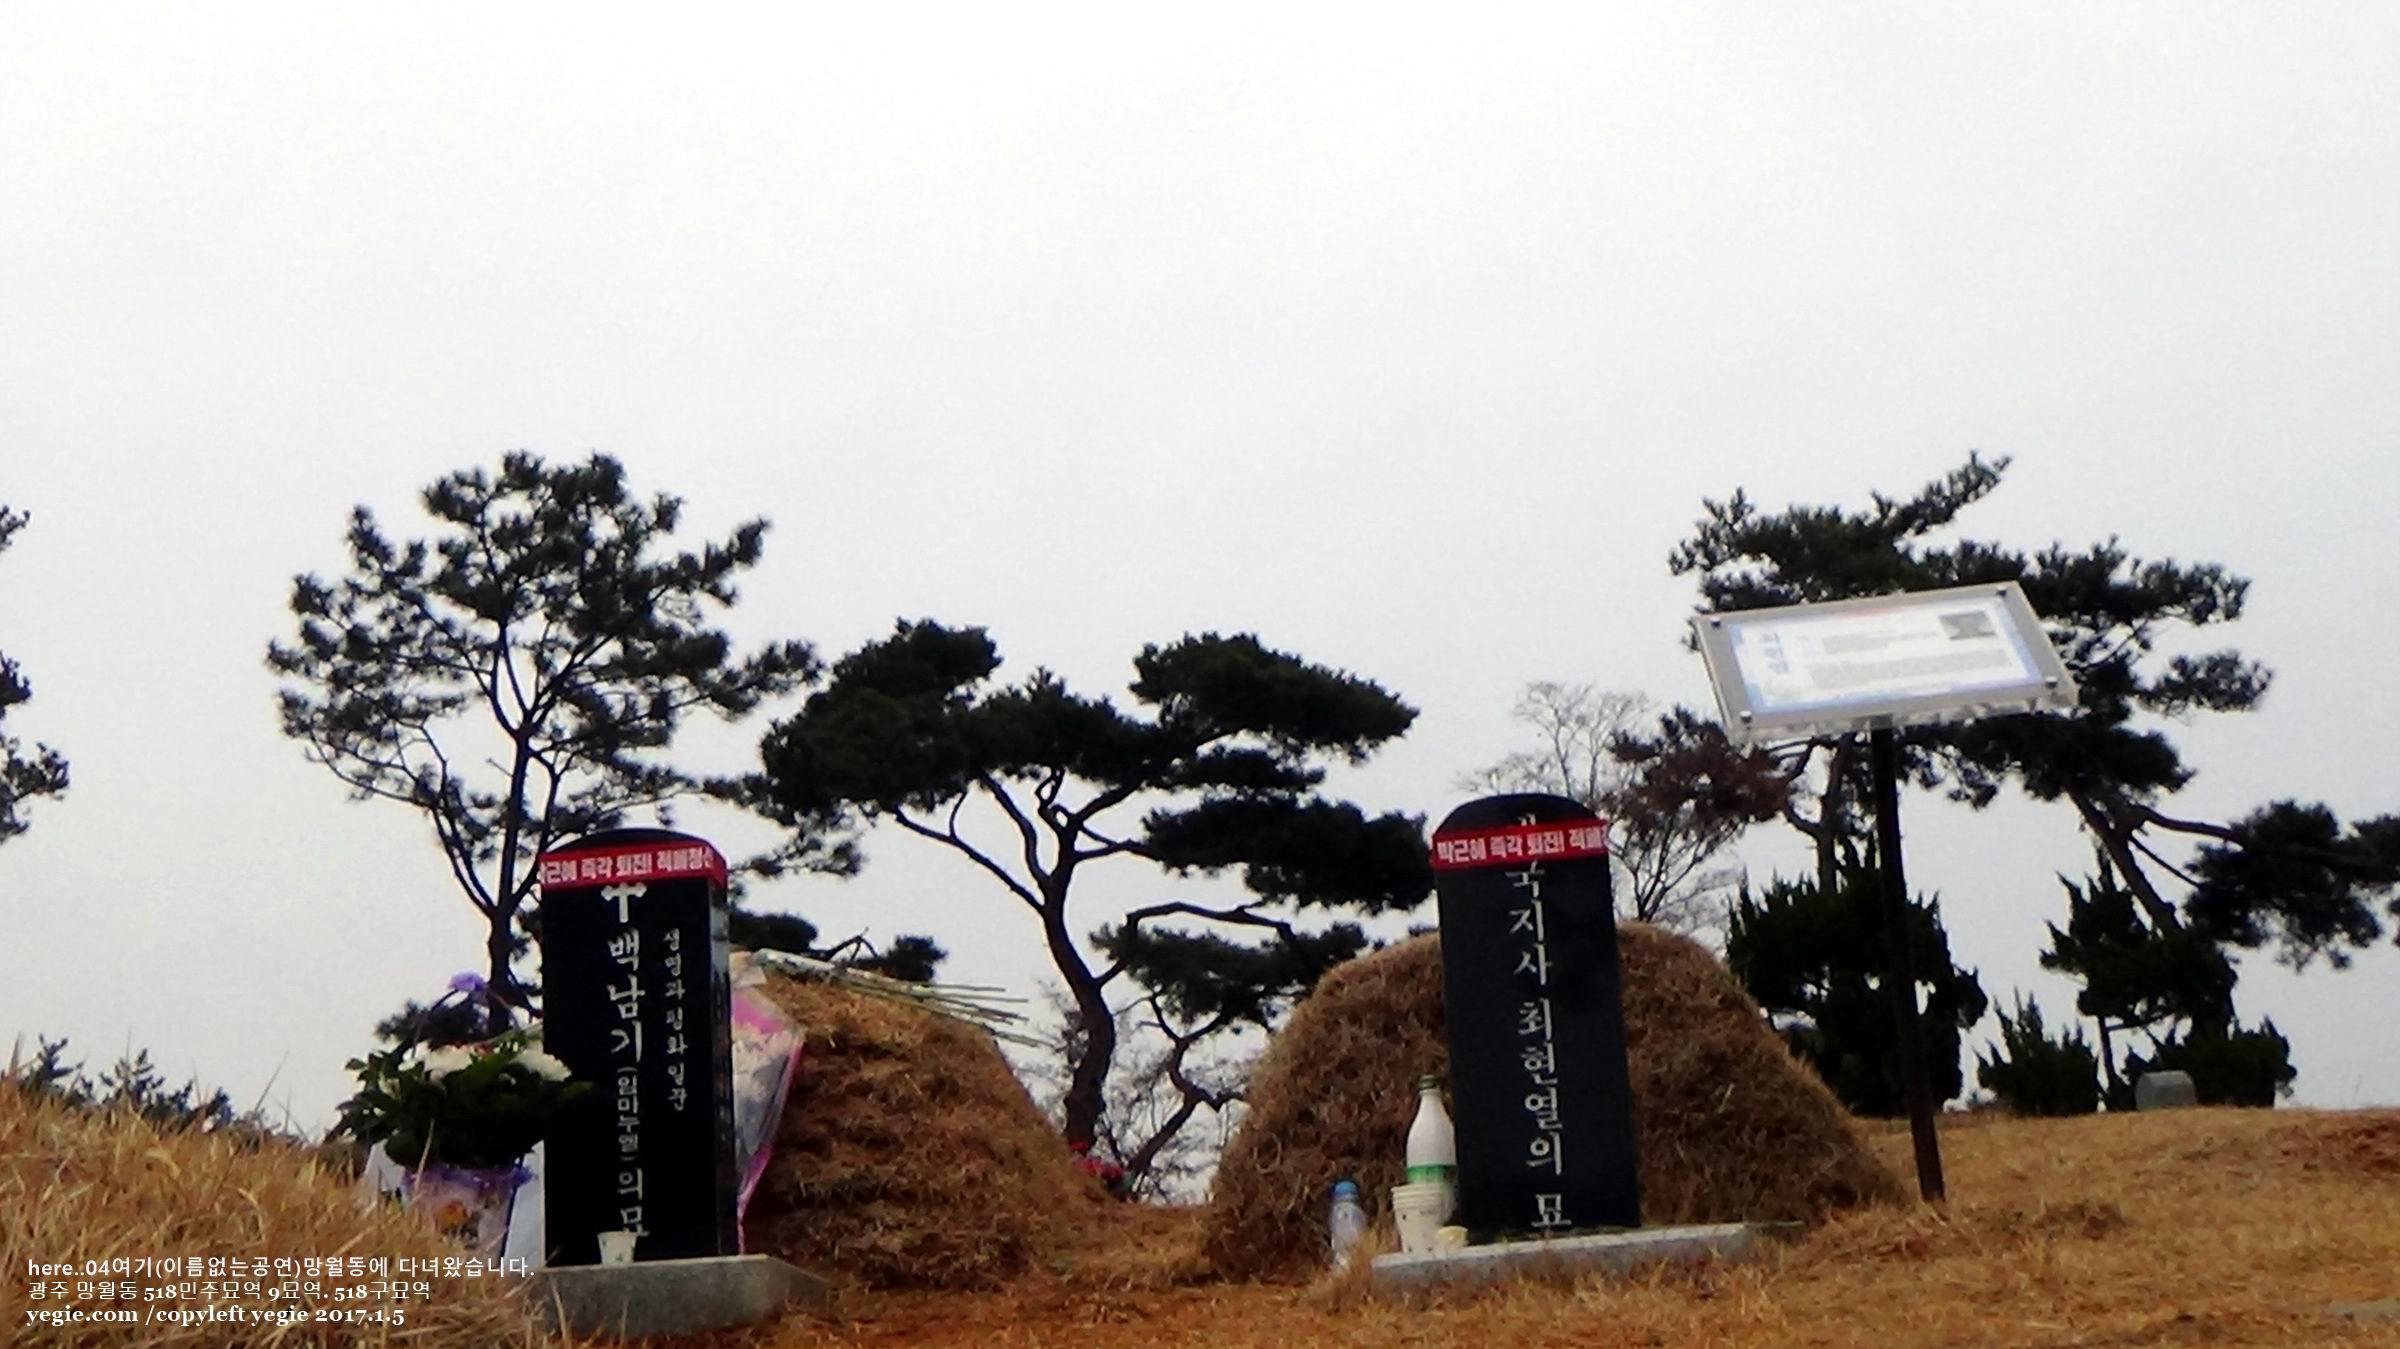 here 여기 04(이름없는공연)망월동518민주묘역 9묘역,구묘역